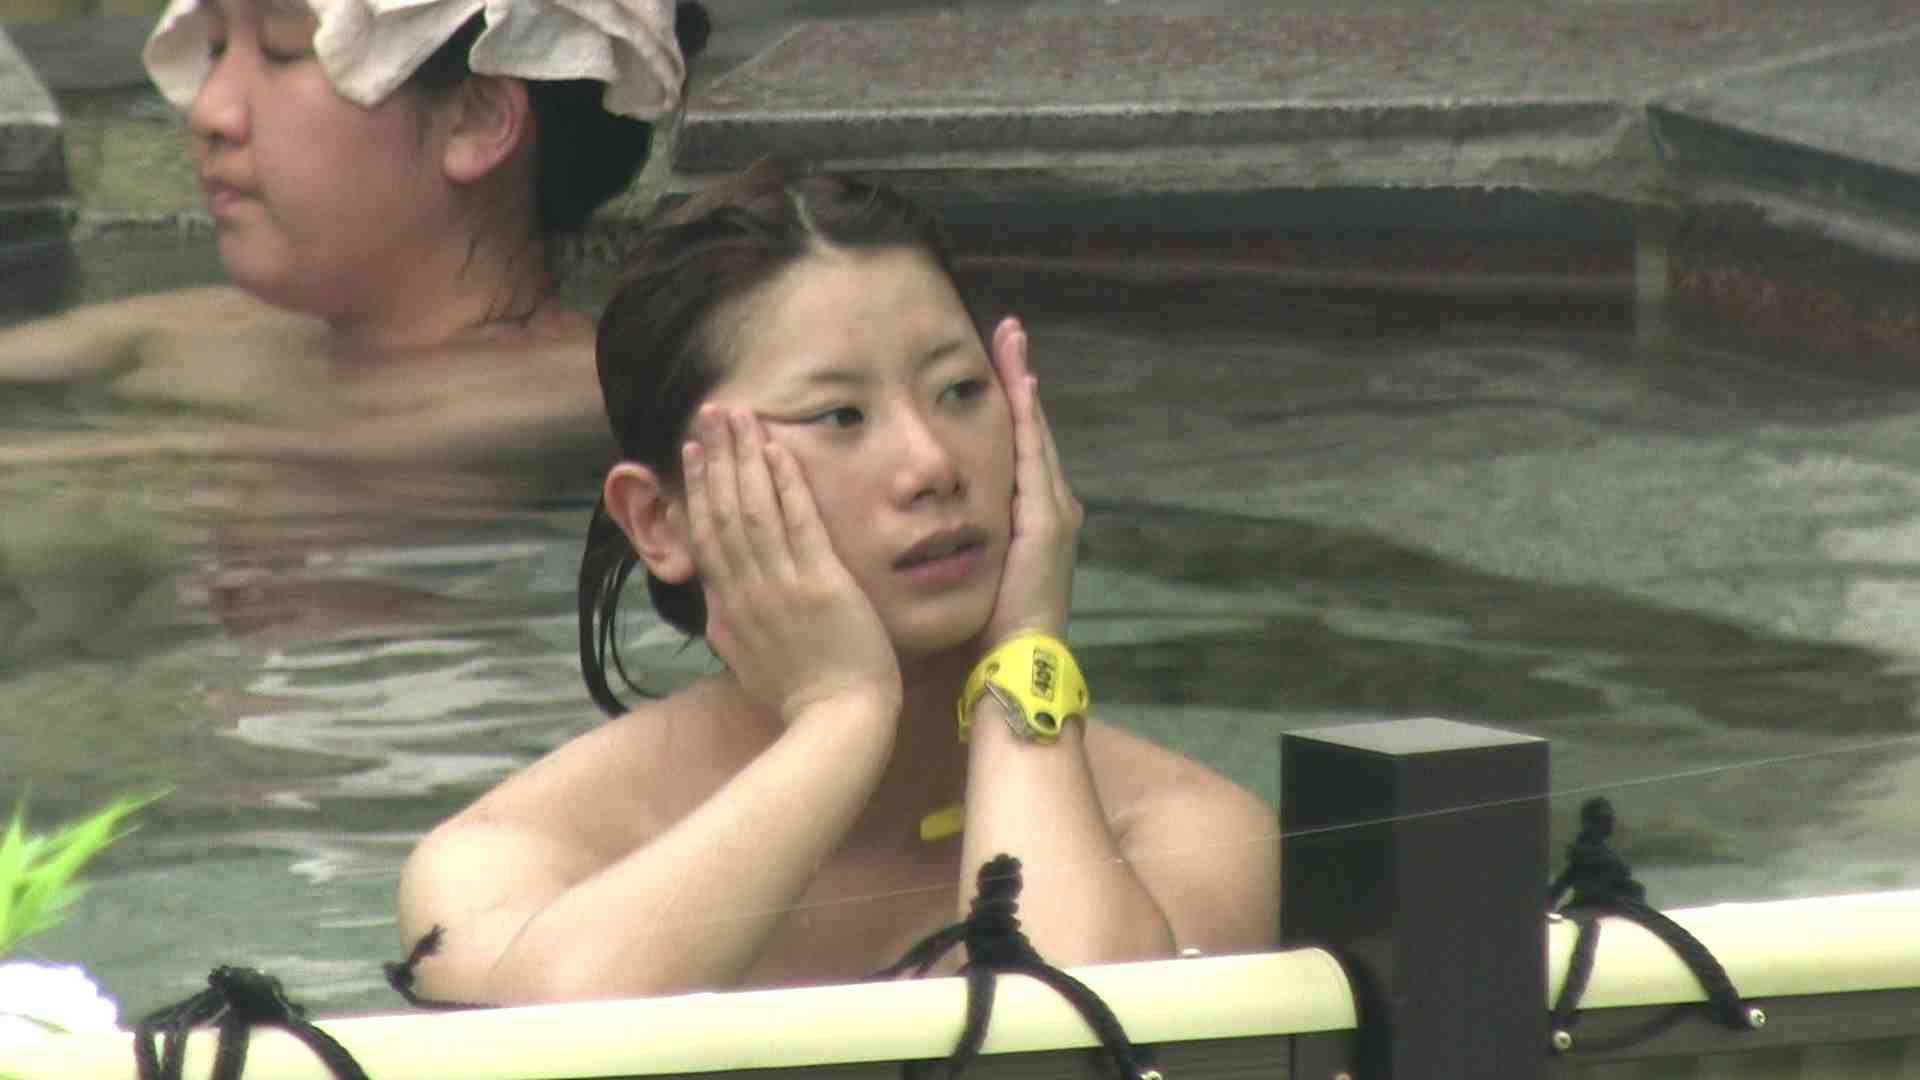 Aquaな露天風呂Vol.19【VIP】 盗撮 | HなOL  88pic 5